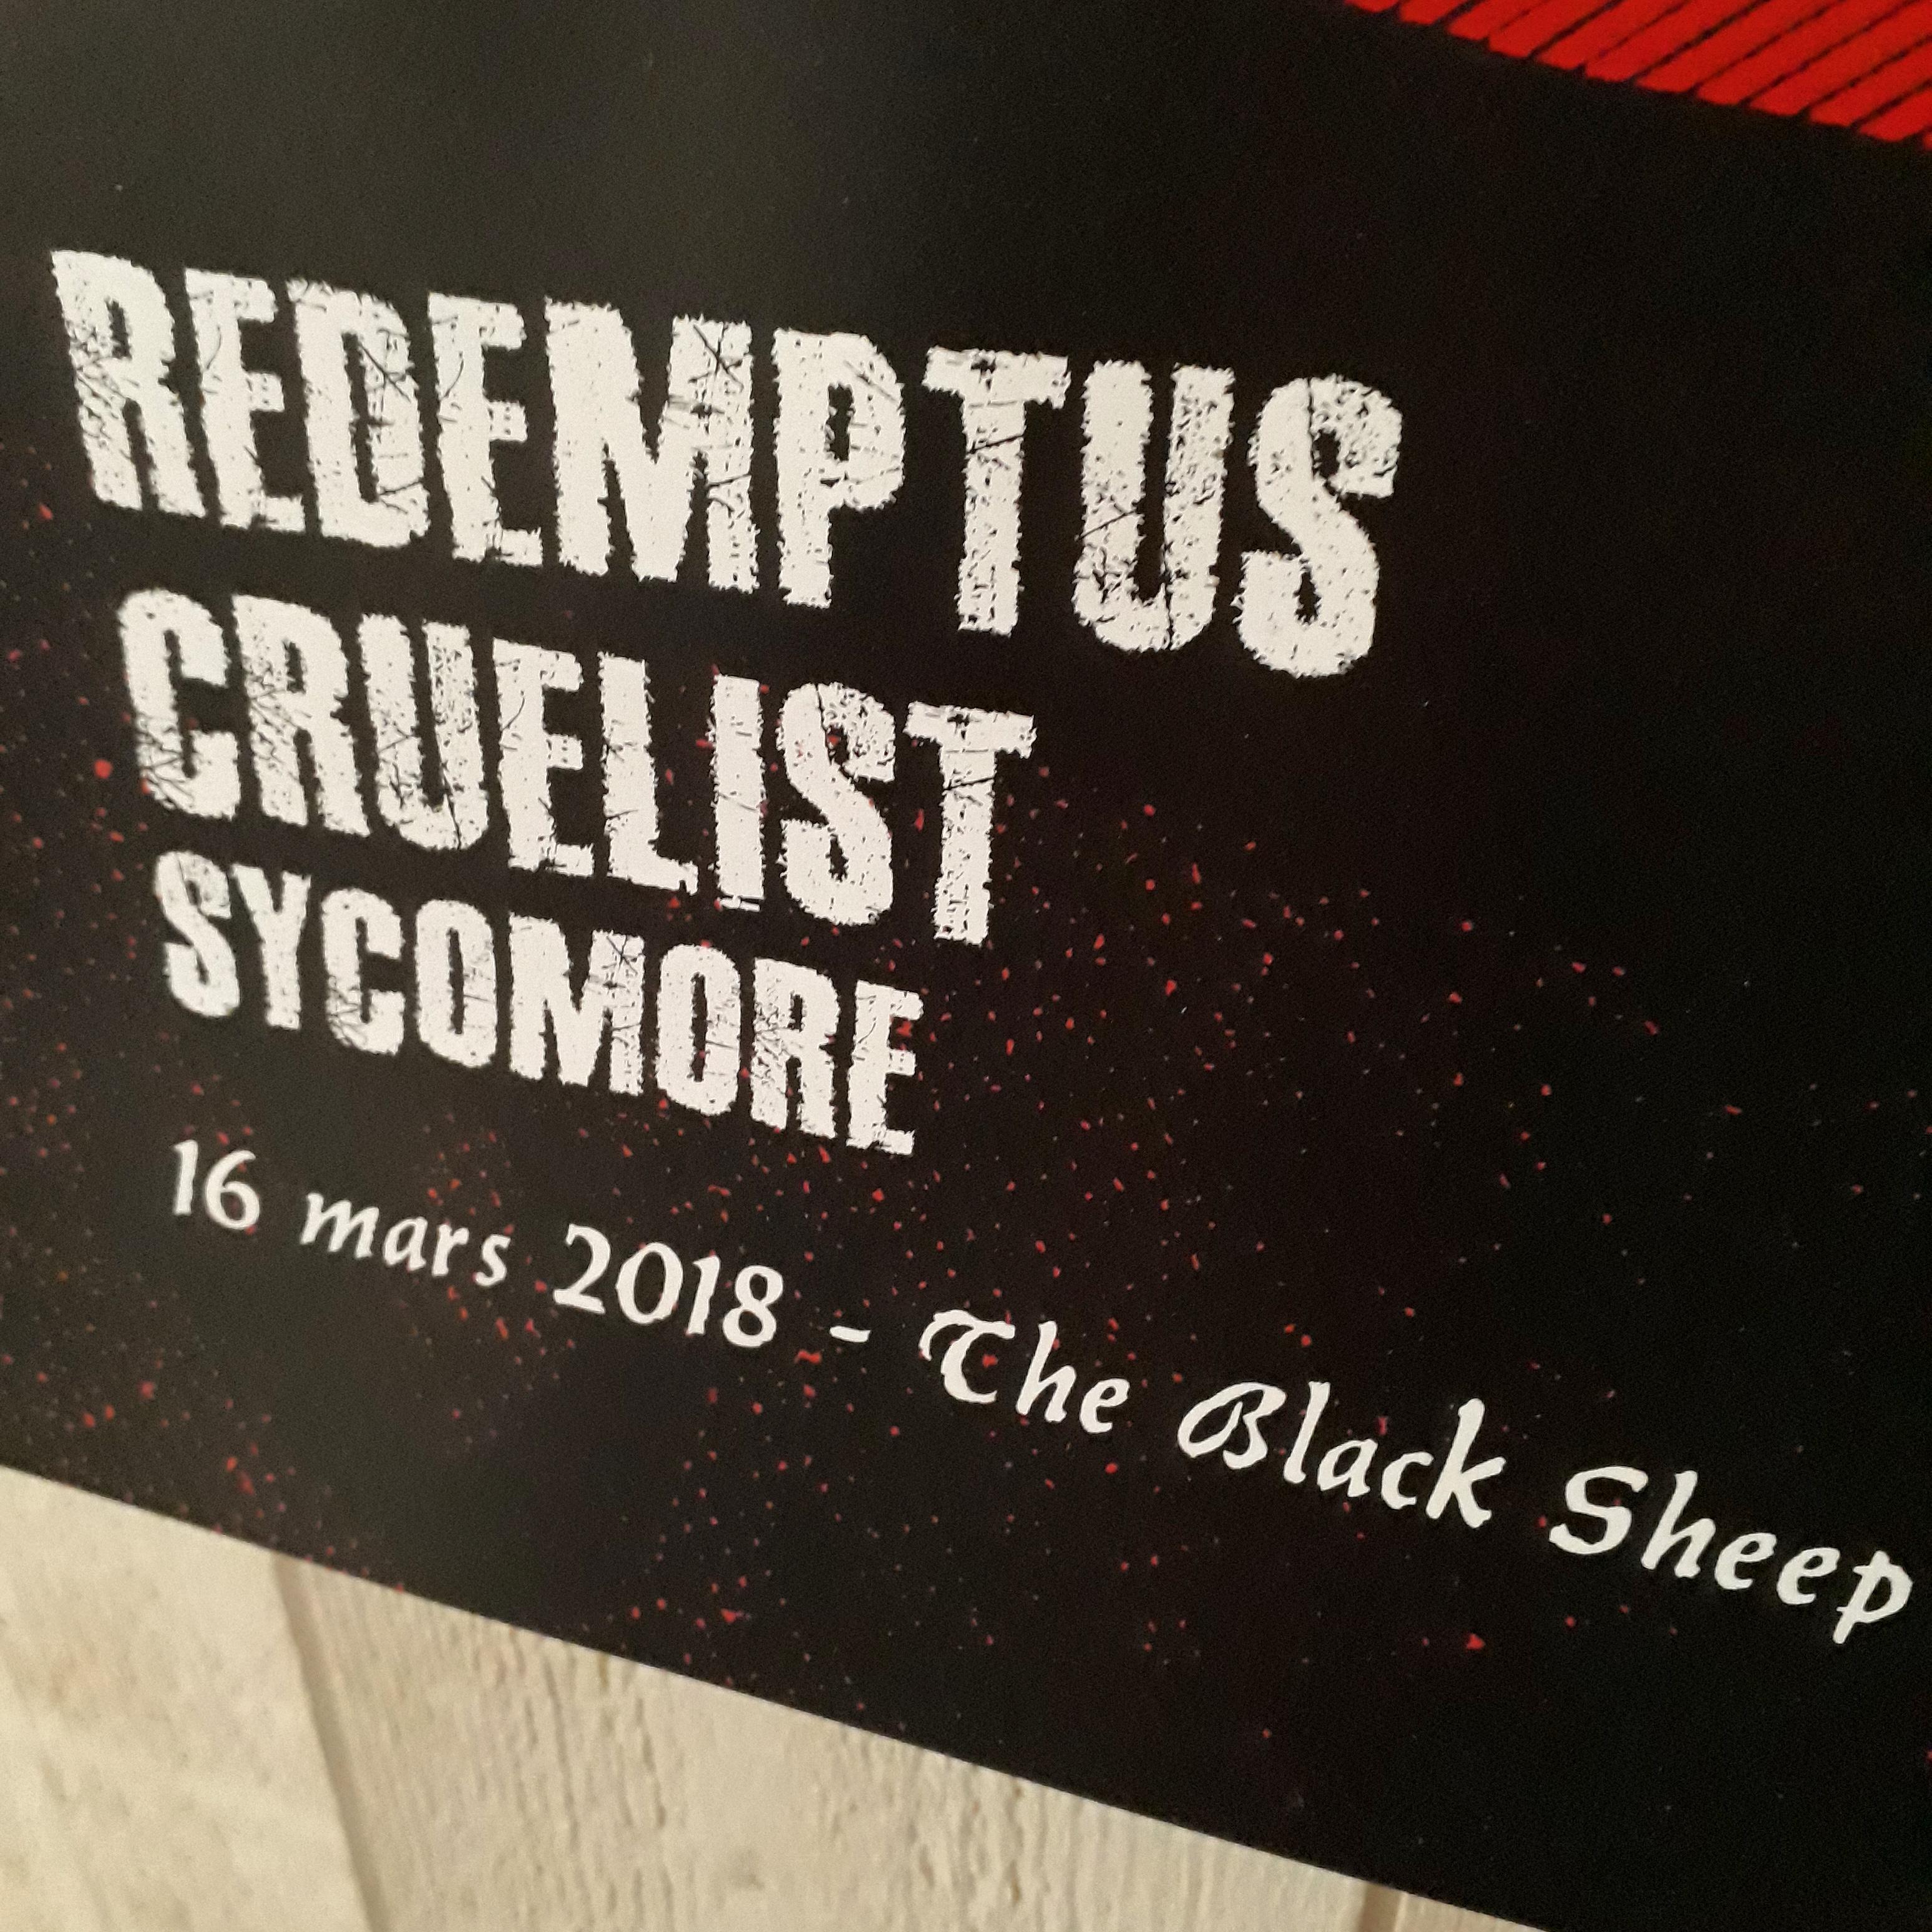 REDEMPTUS + CRUELIST + SYCOMORE